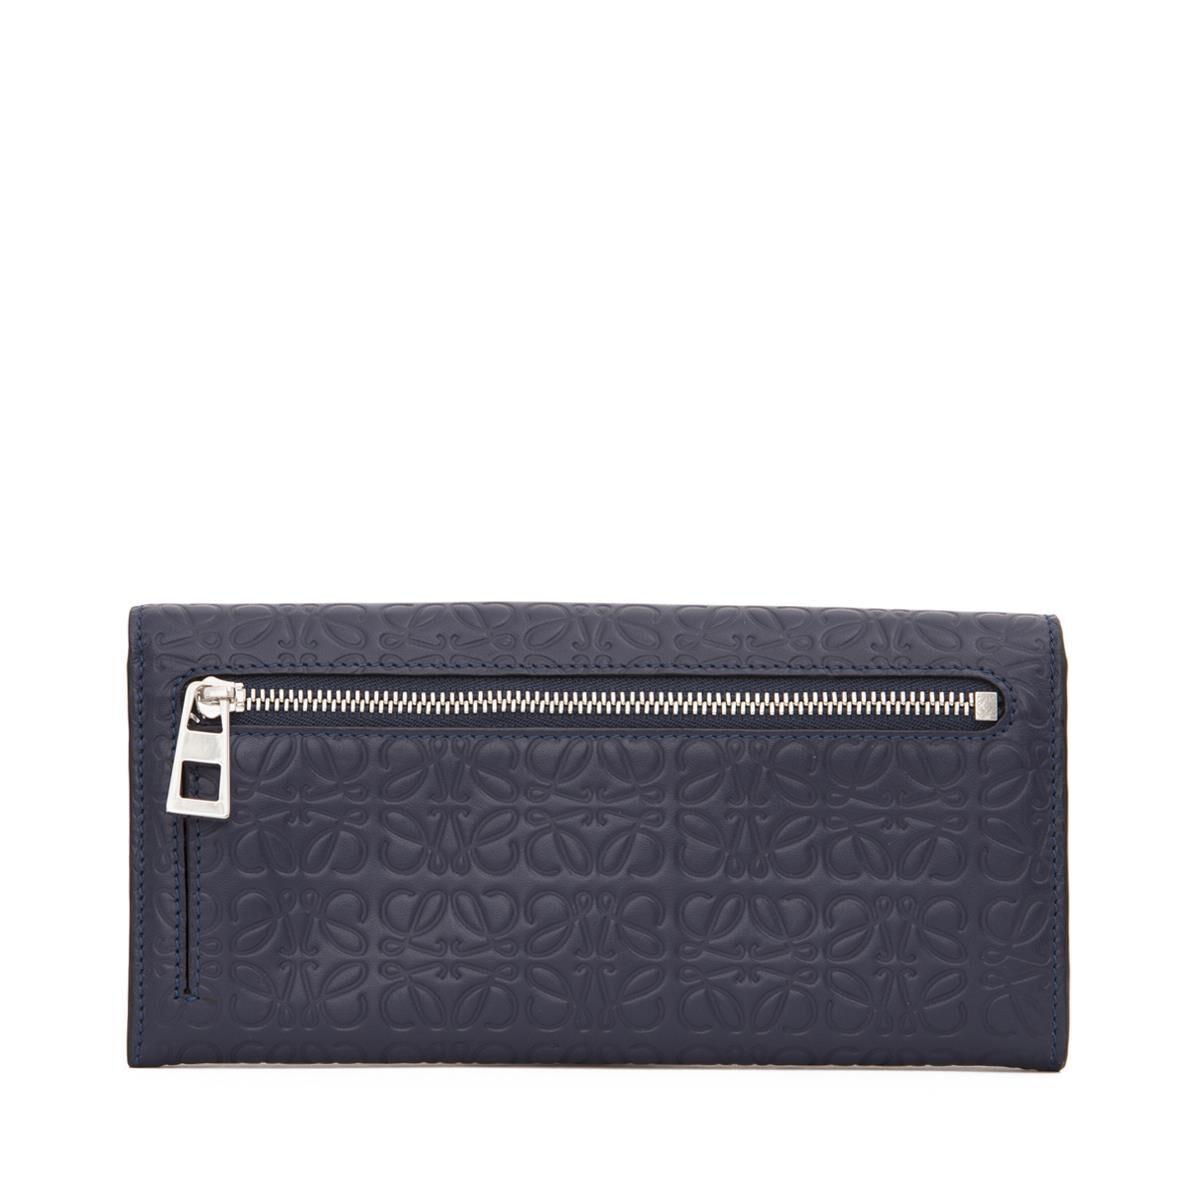 LOEWE Continental Wallet Navy Blue all